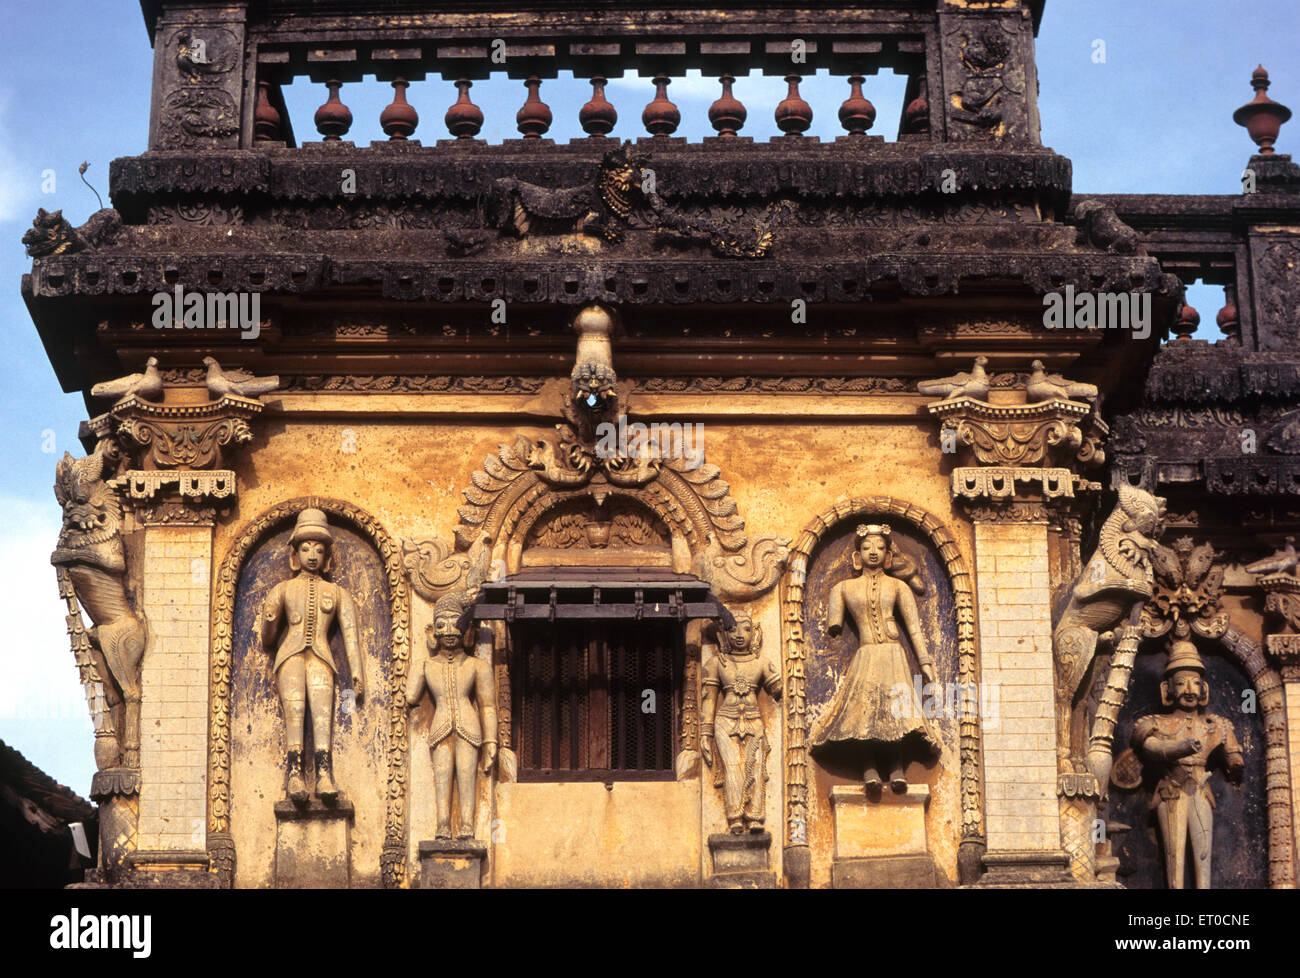 Sahib and lady carved on Nattukottai chettiar or nagarathar house ; Chettinad ; Tamil Nadu ; India - Stock Image